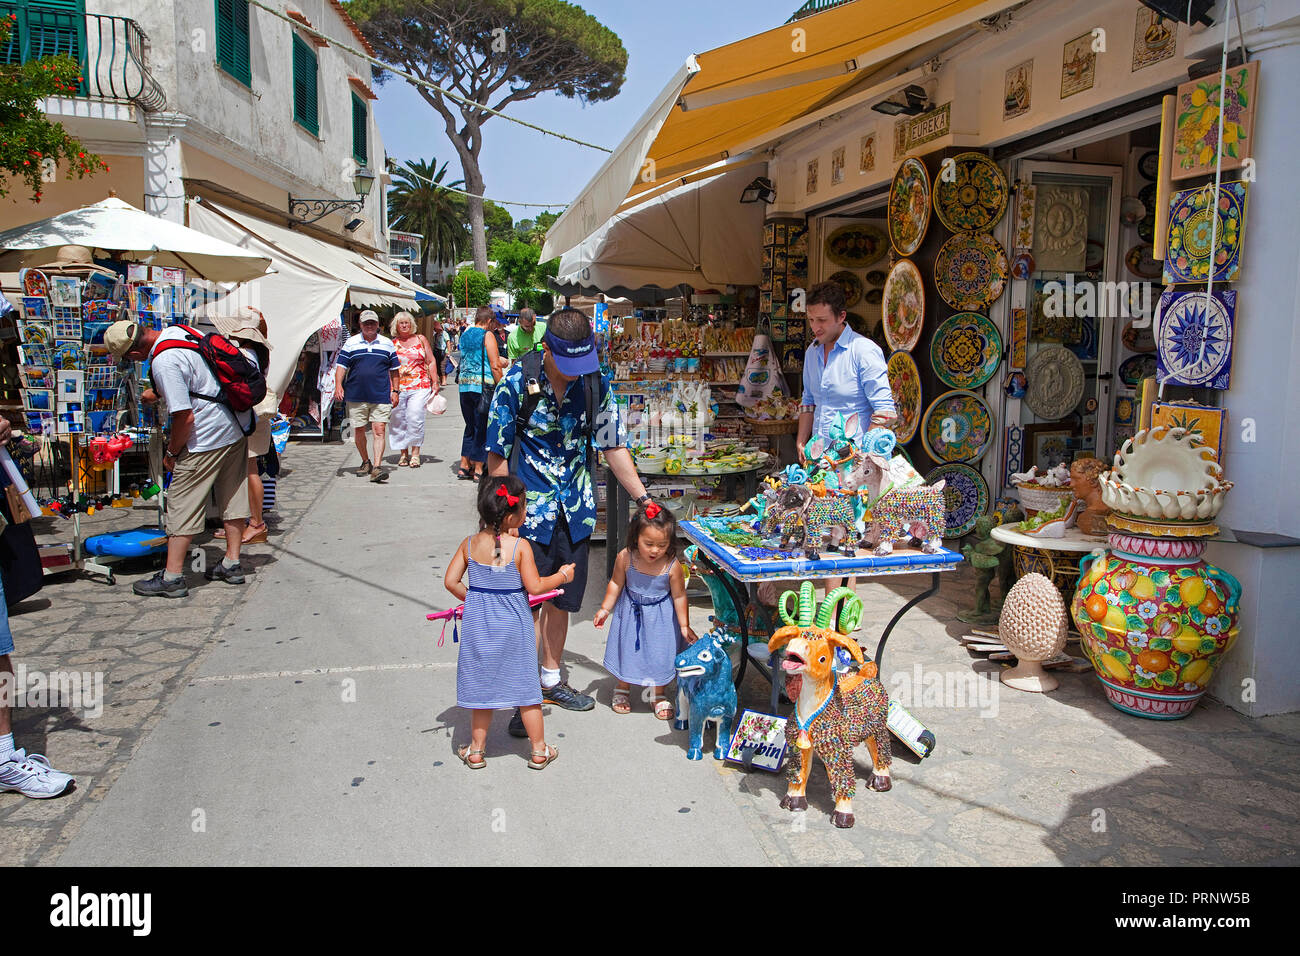 Tourists at souvenir shops, Anacapri, Capri island, Gulf of Naples, Campania, Italy - Stock Image